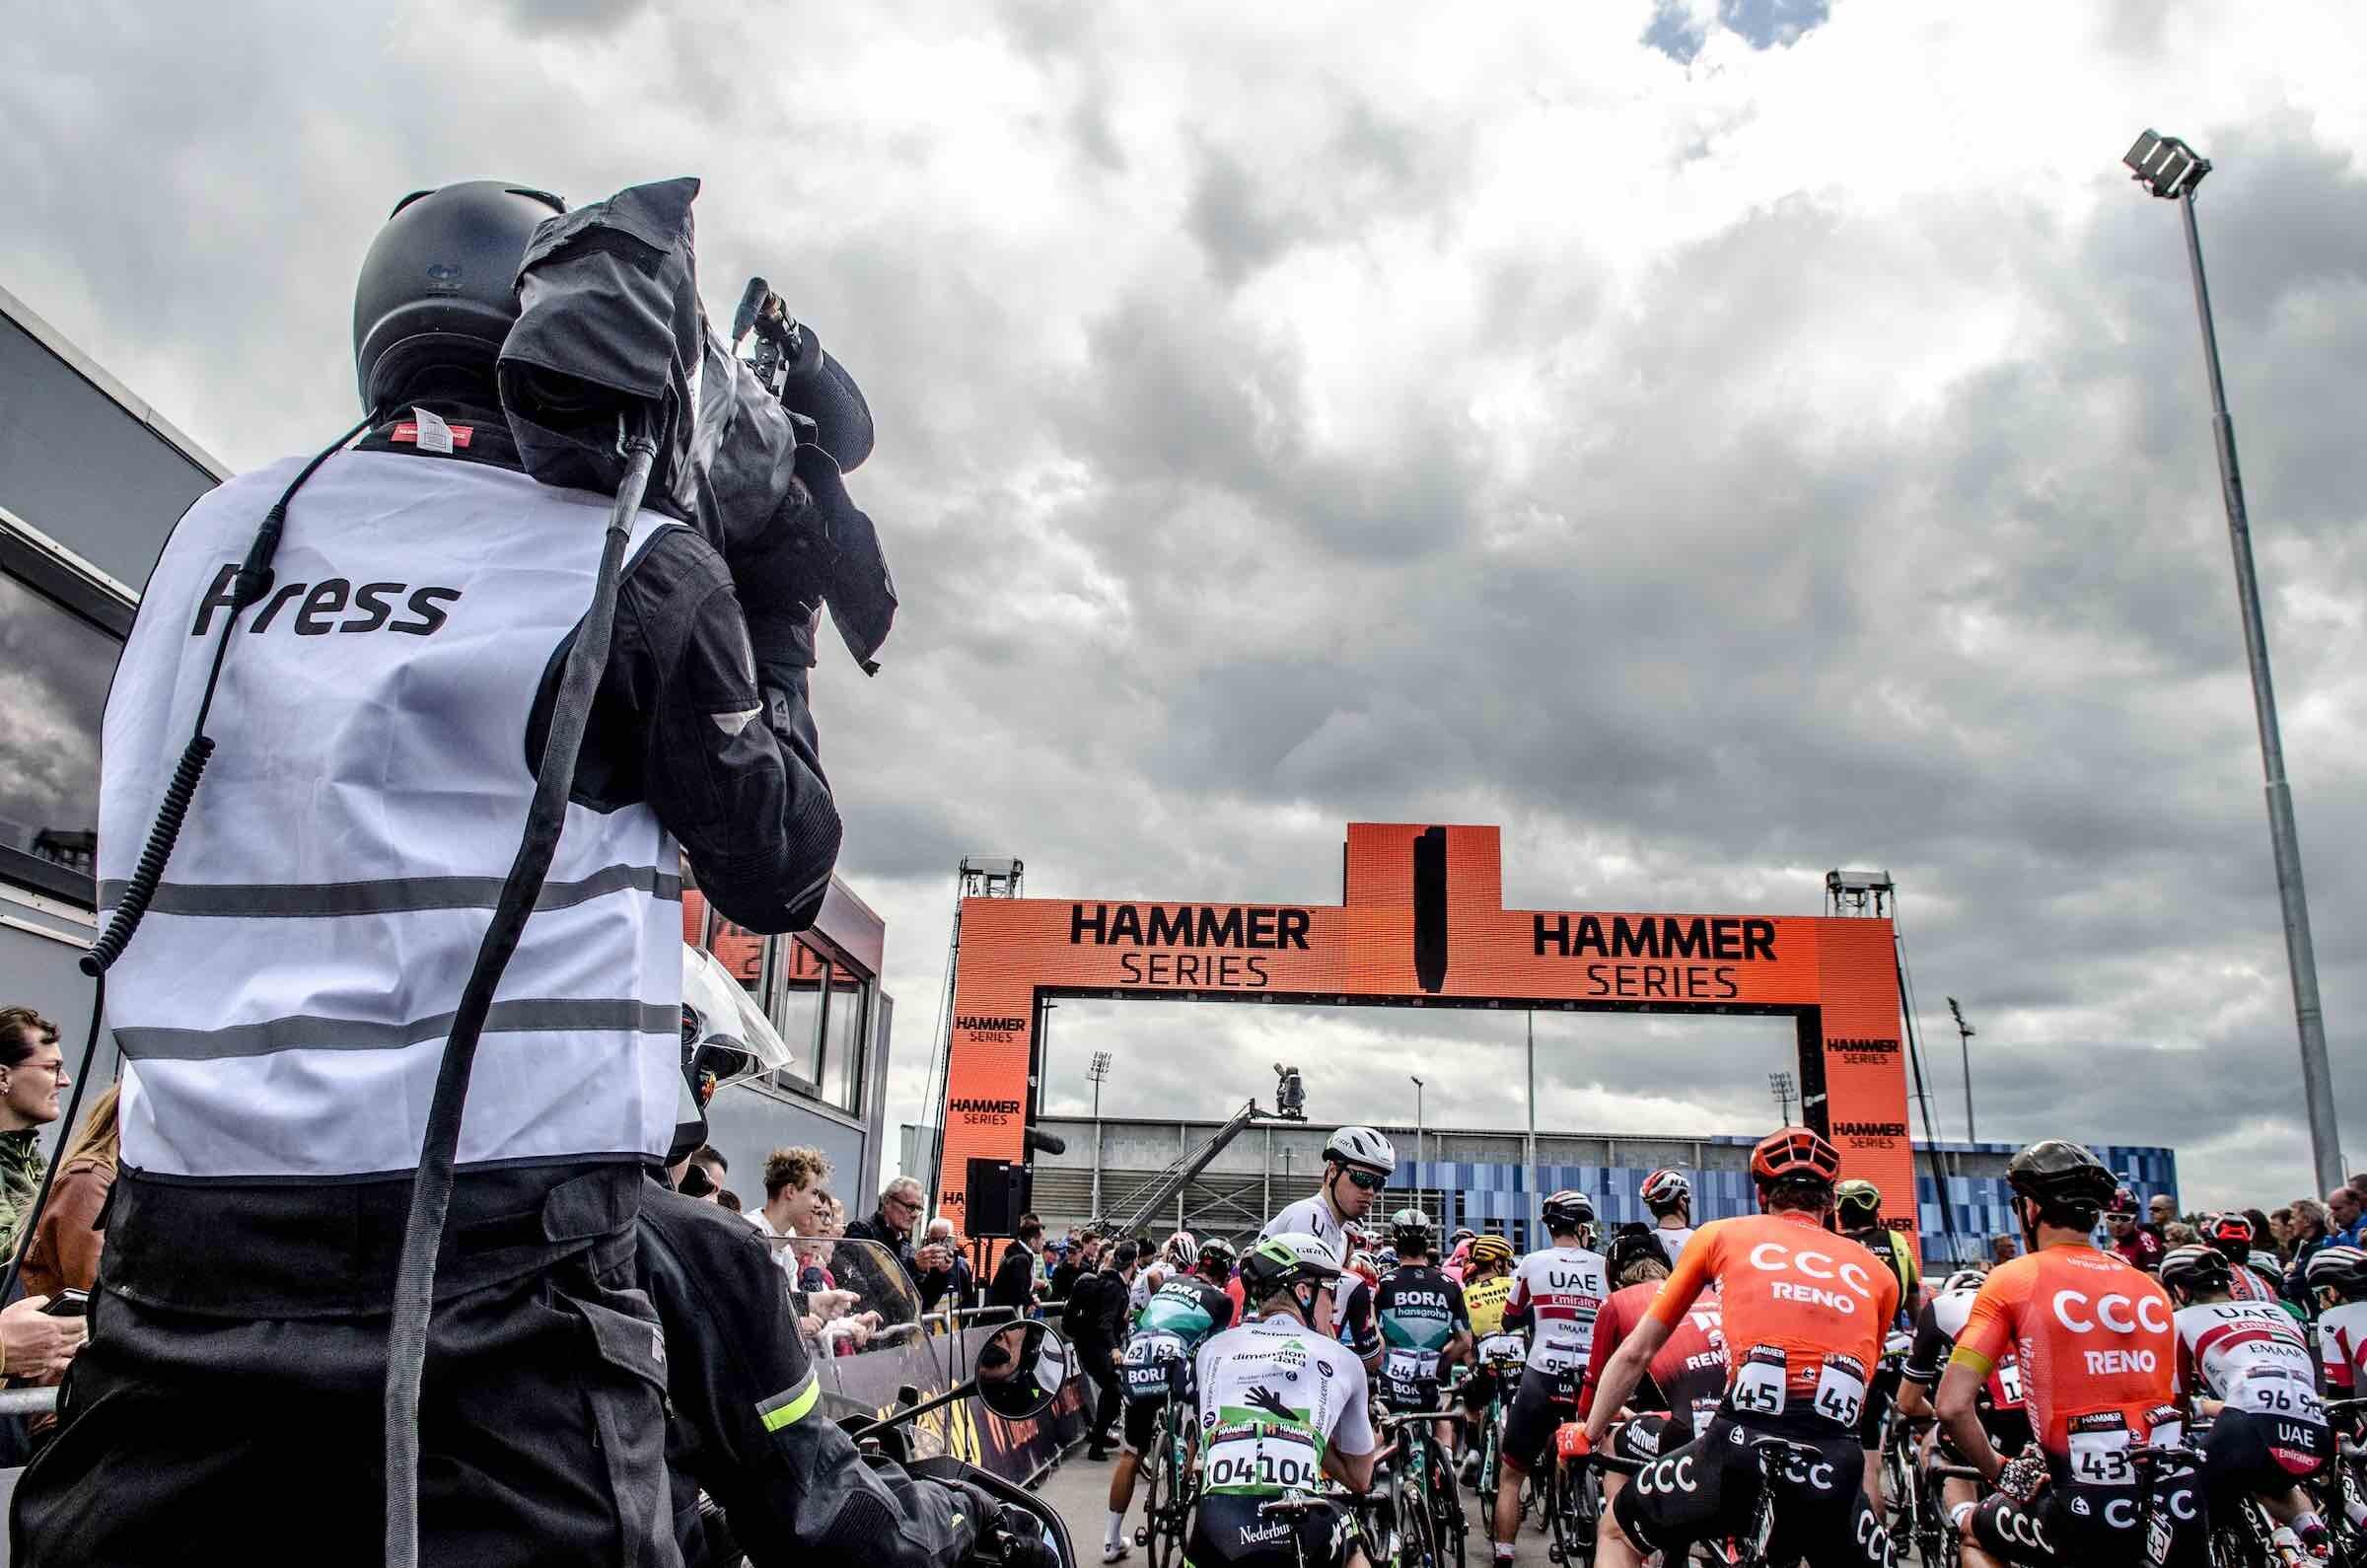 Hammer Limburg 2019 start 2400.jpg